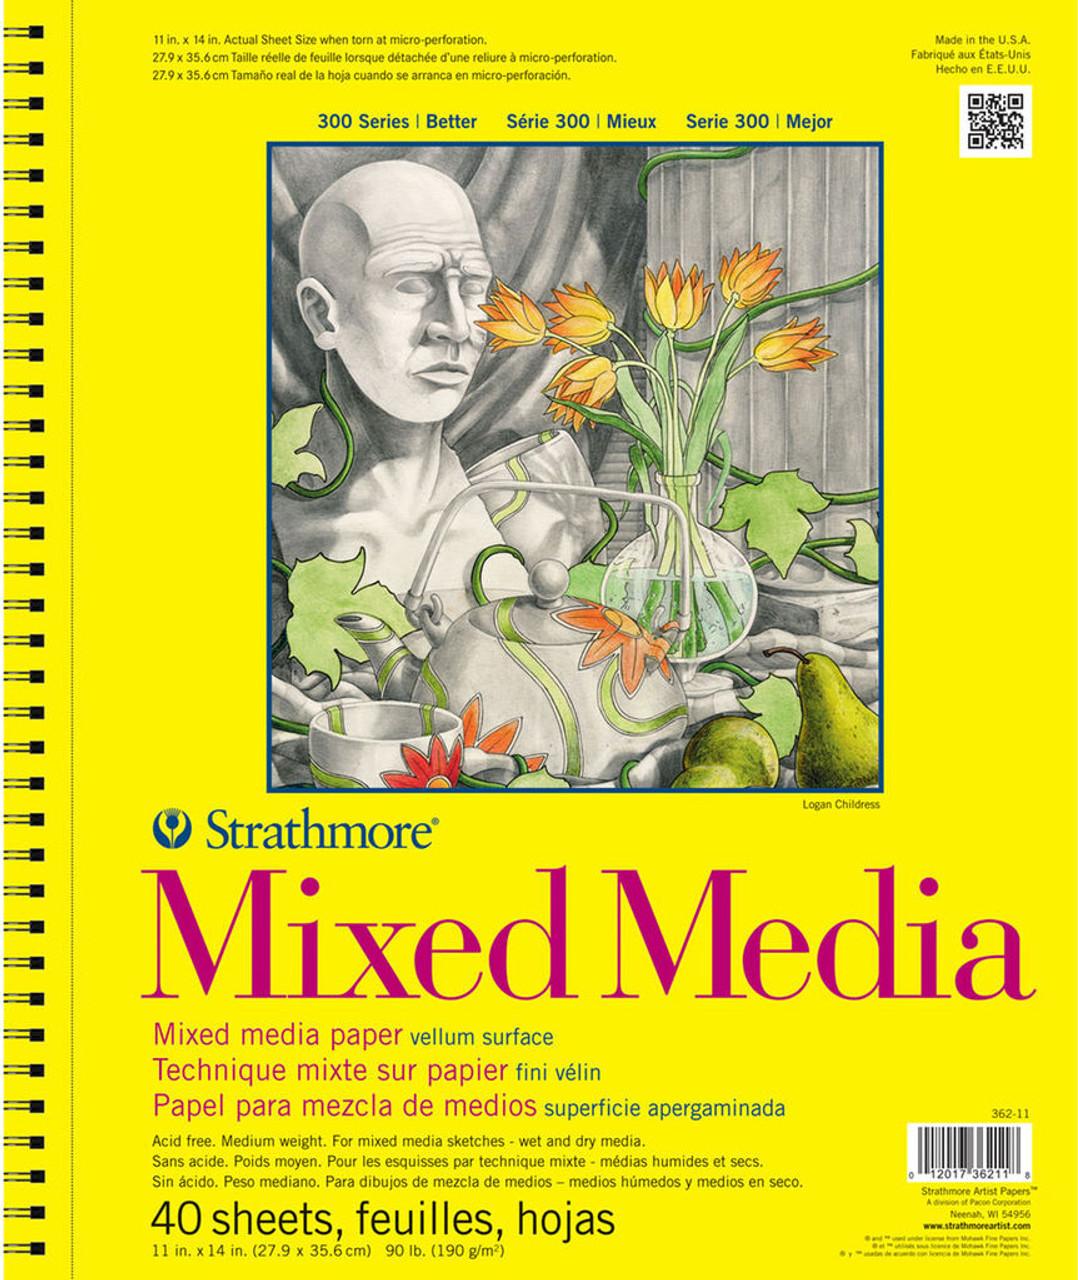 Strathmore 300 Series Mixed Media Pad 5.5x8.5